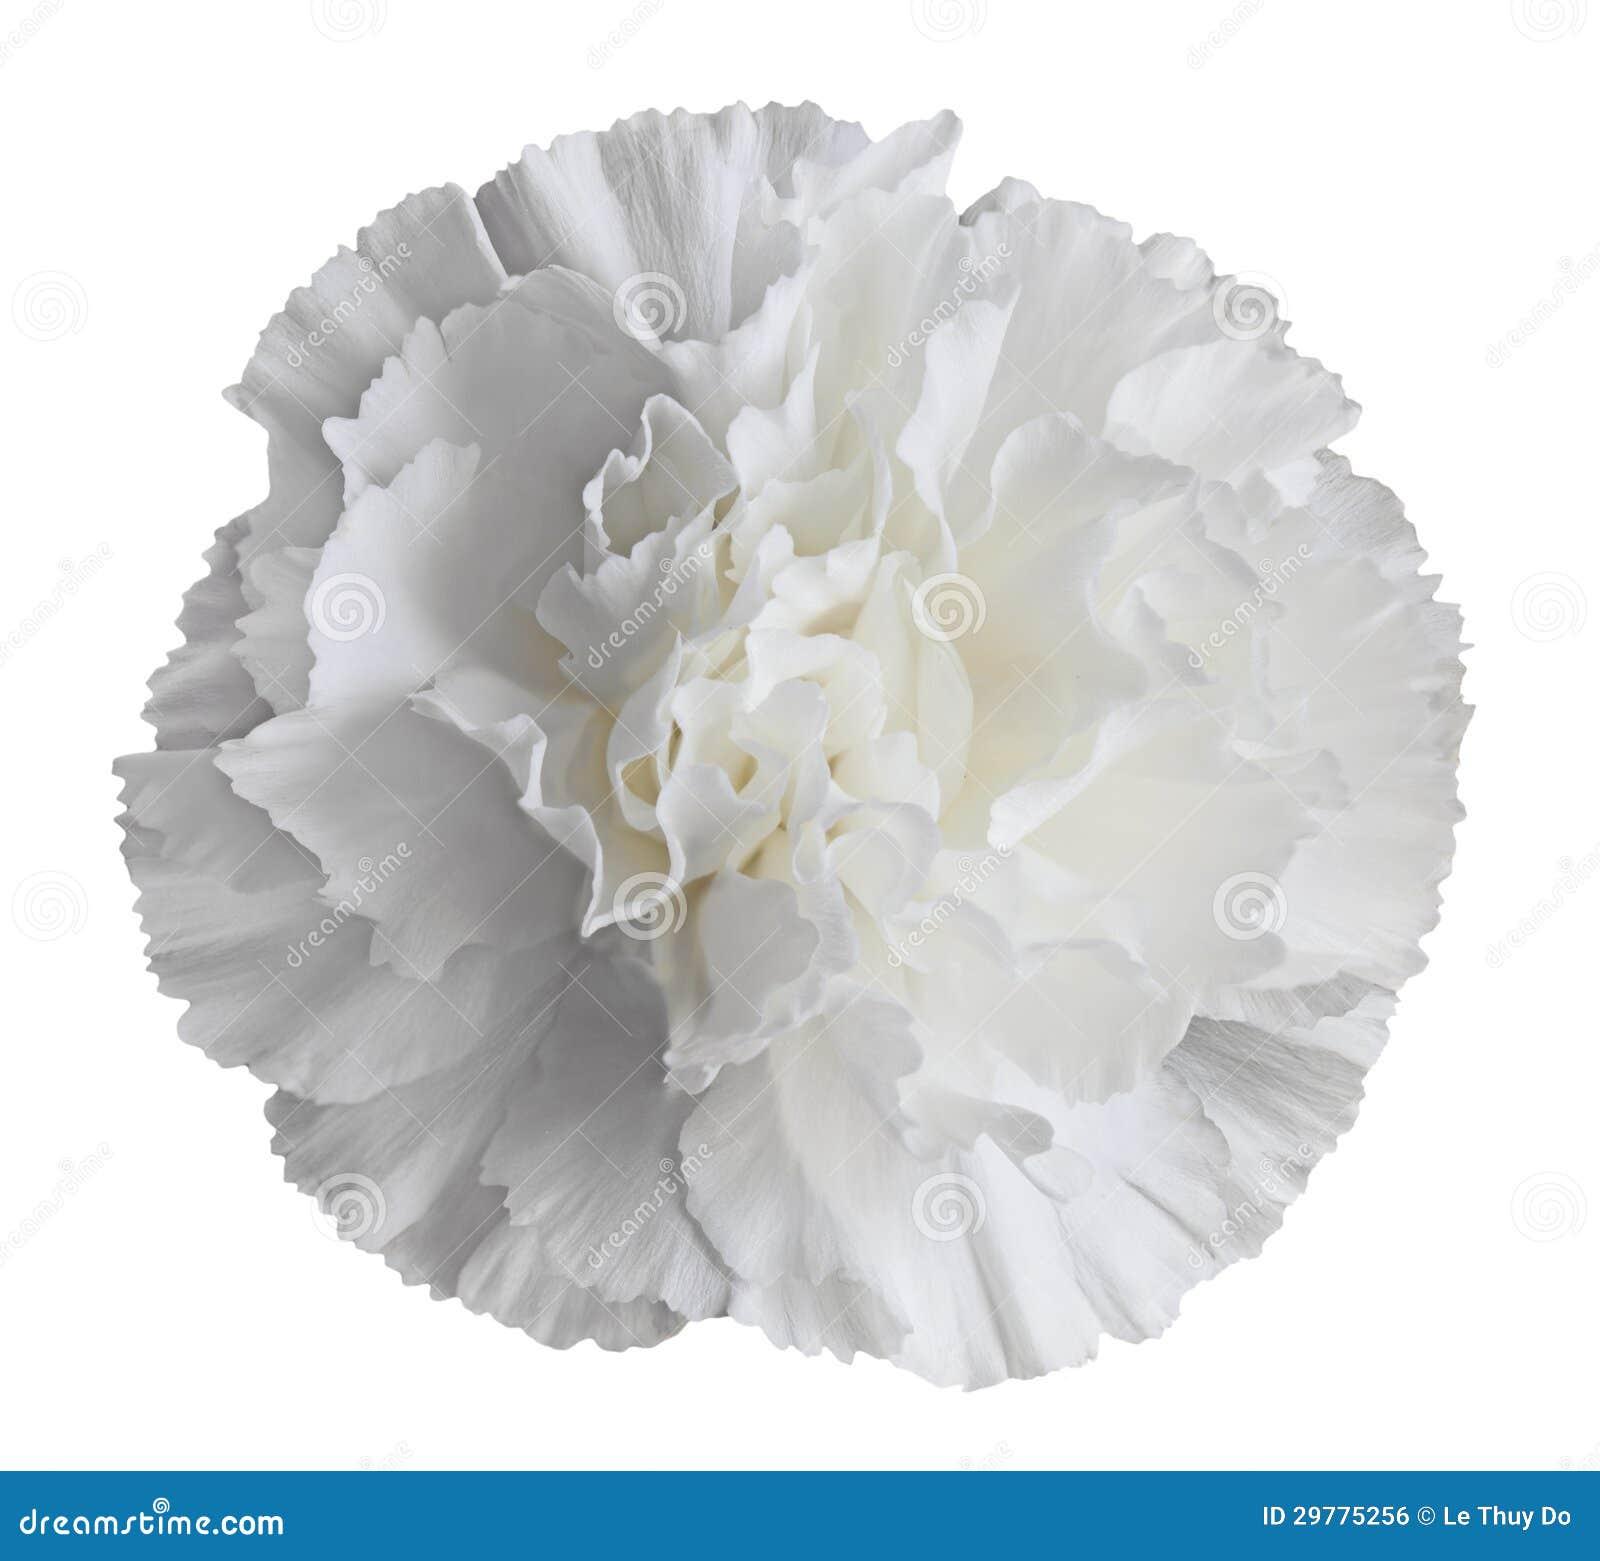 White Carnation Flower Stock Photo Image Of Object White 29775256